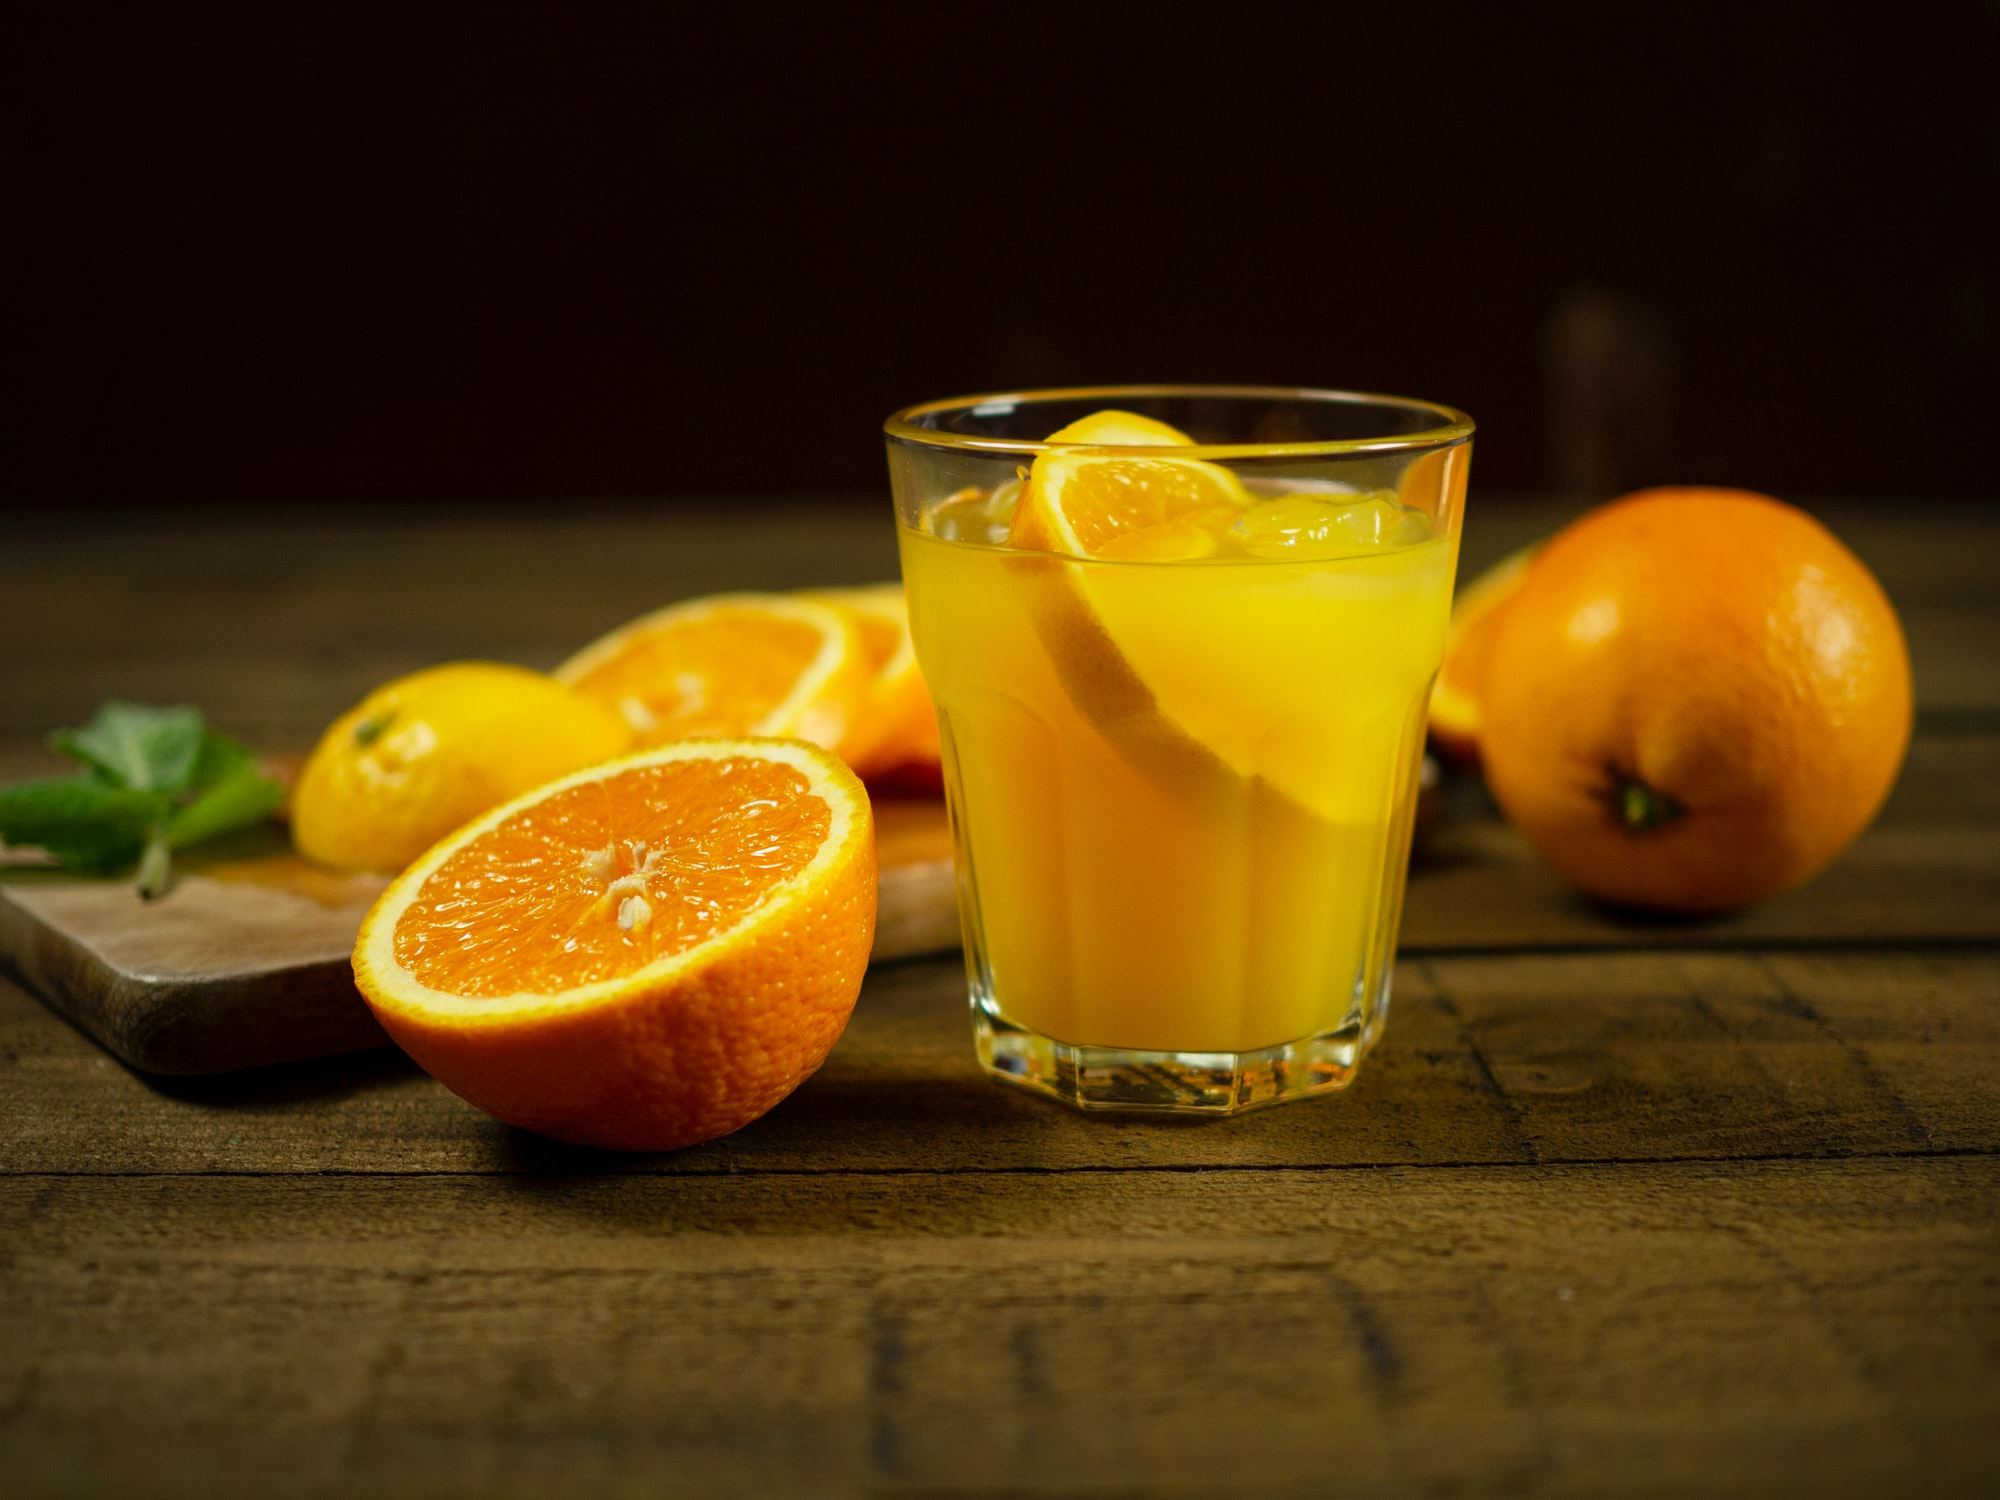 Por qué debes evitar tomar zumos